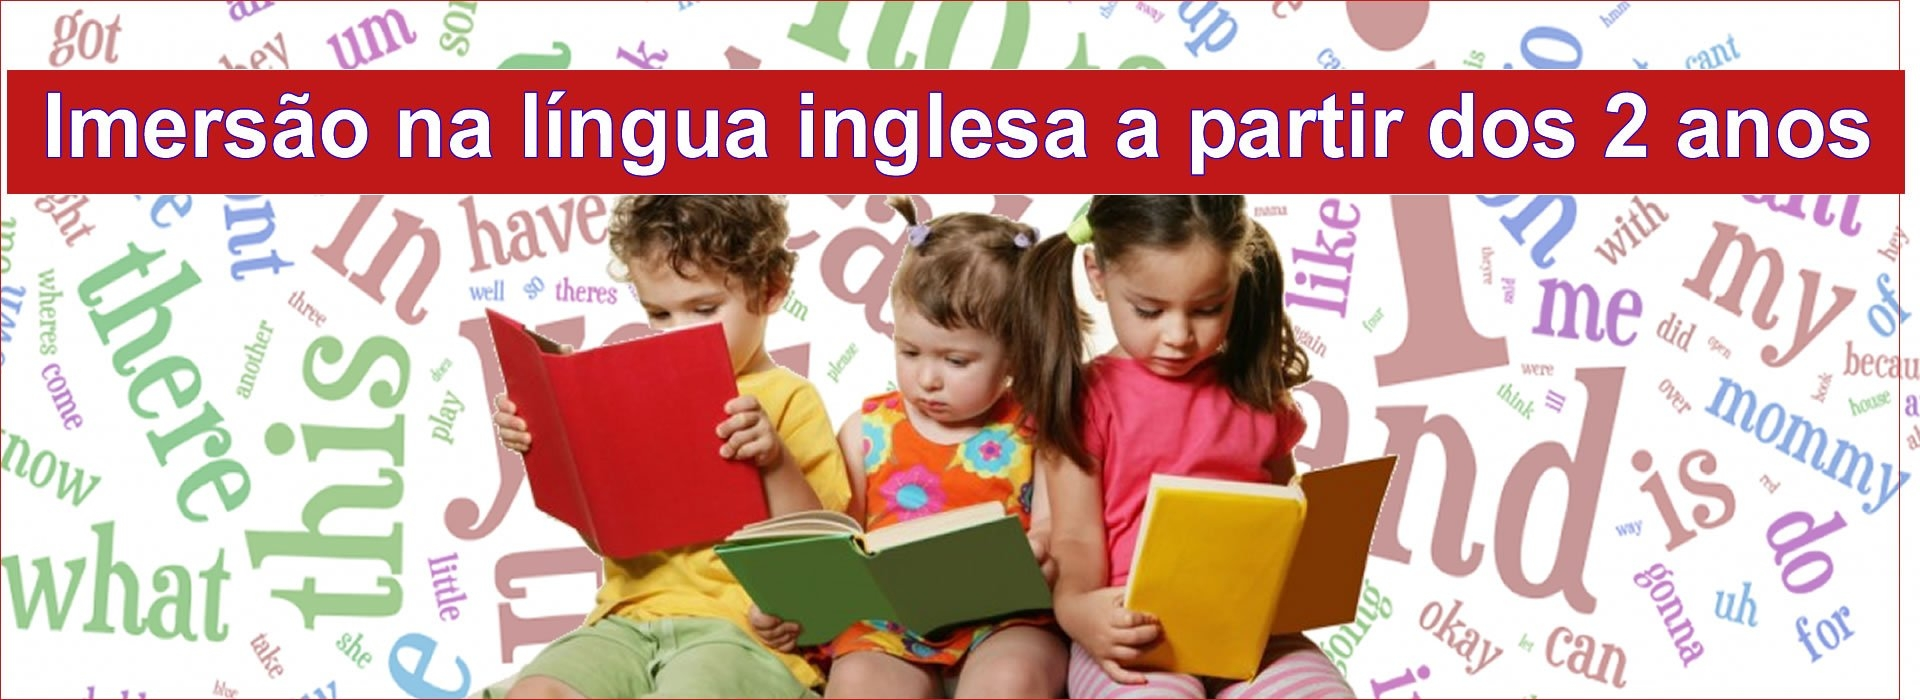 IMERSÃO NA LÍNGUA INGLESA - SEUC